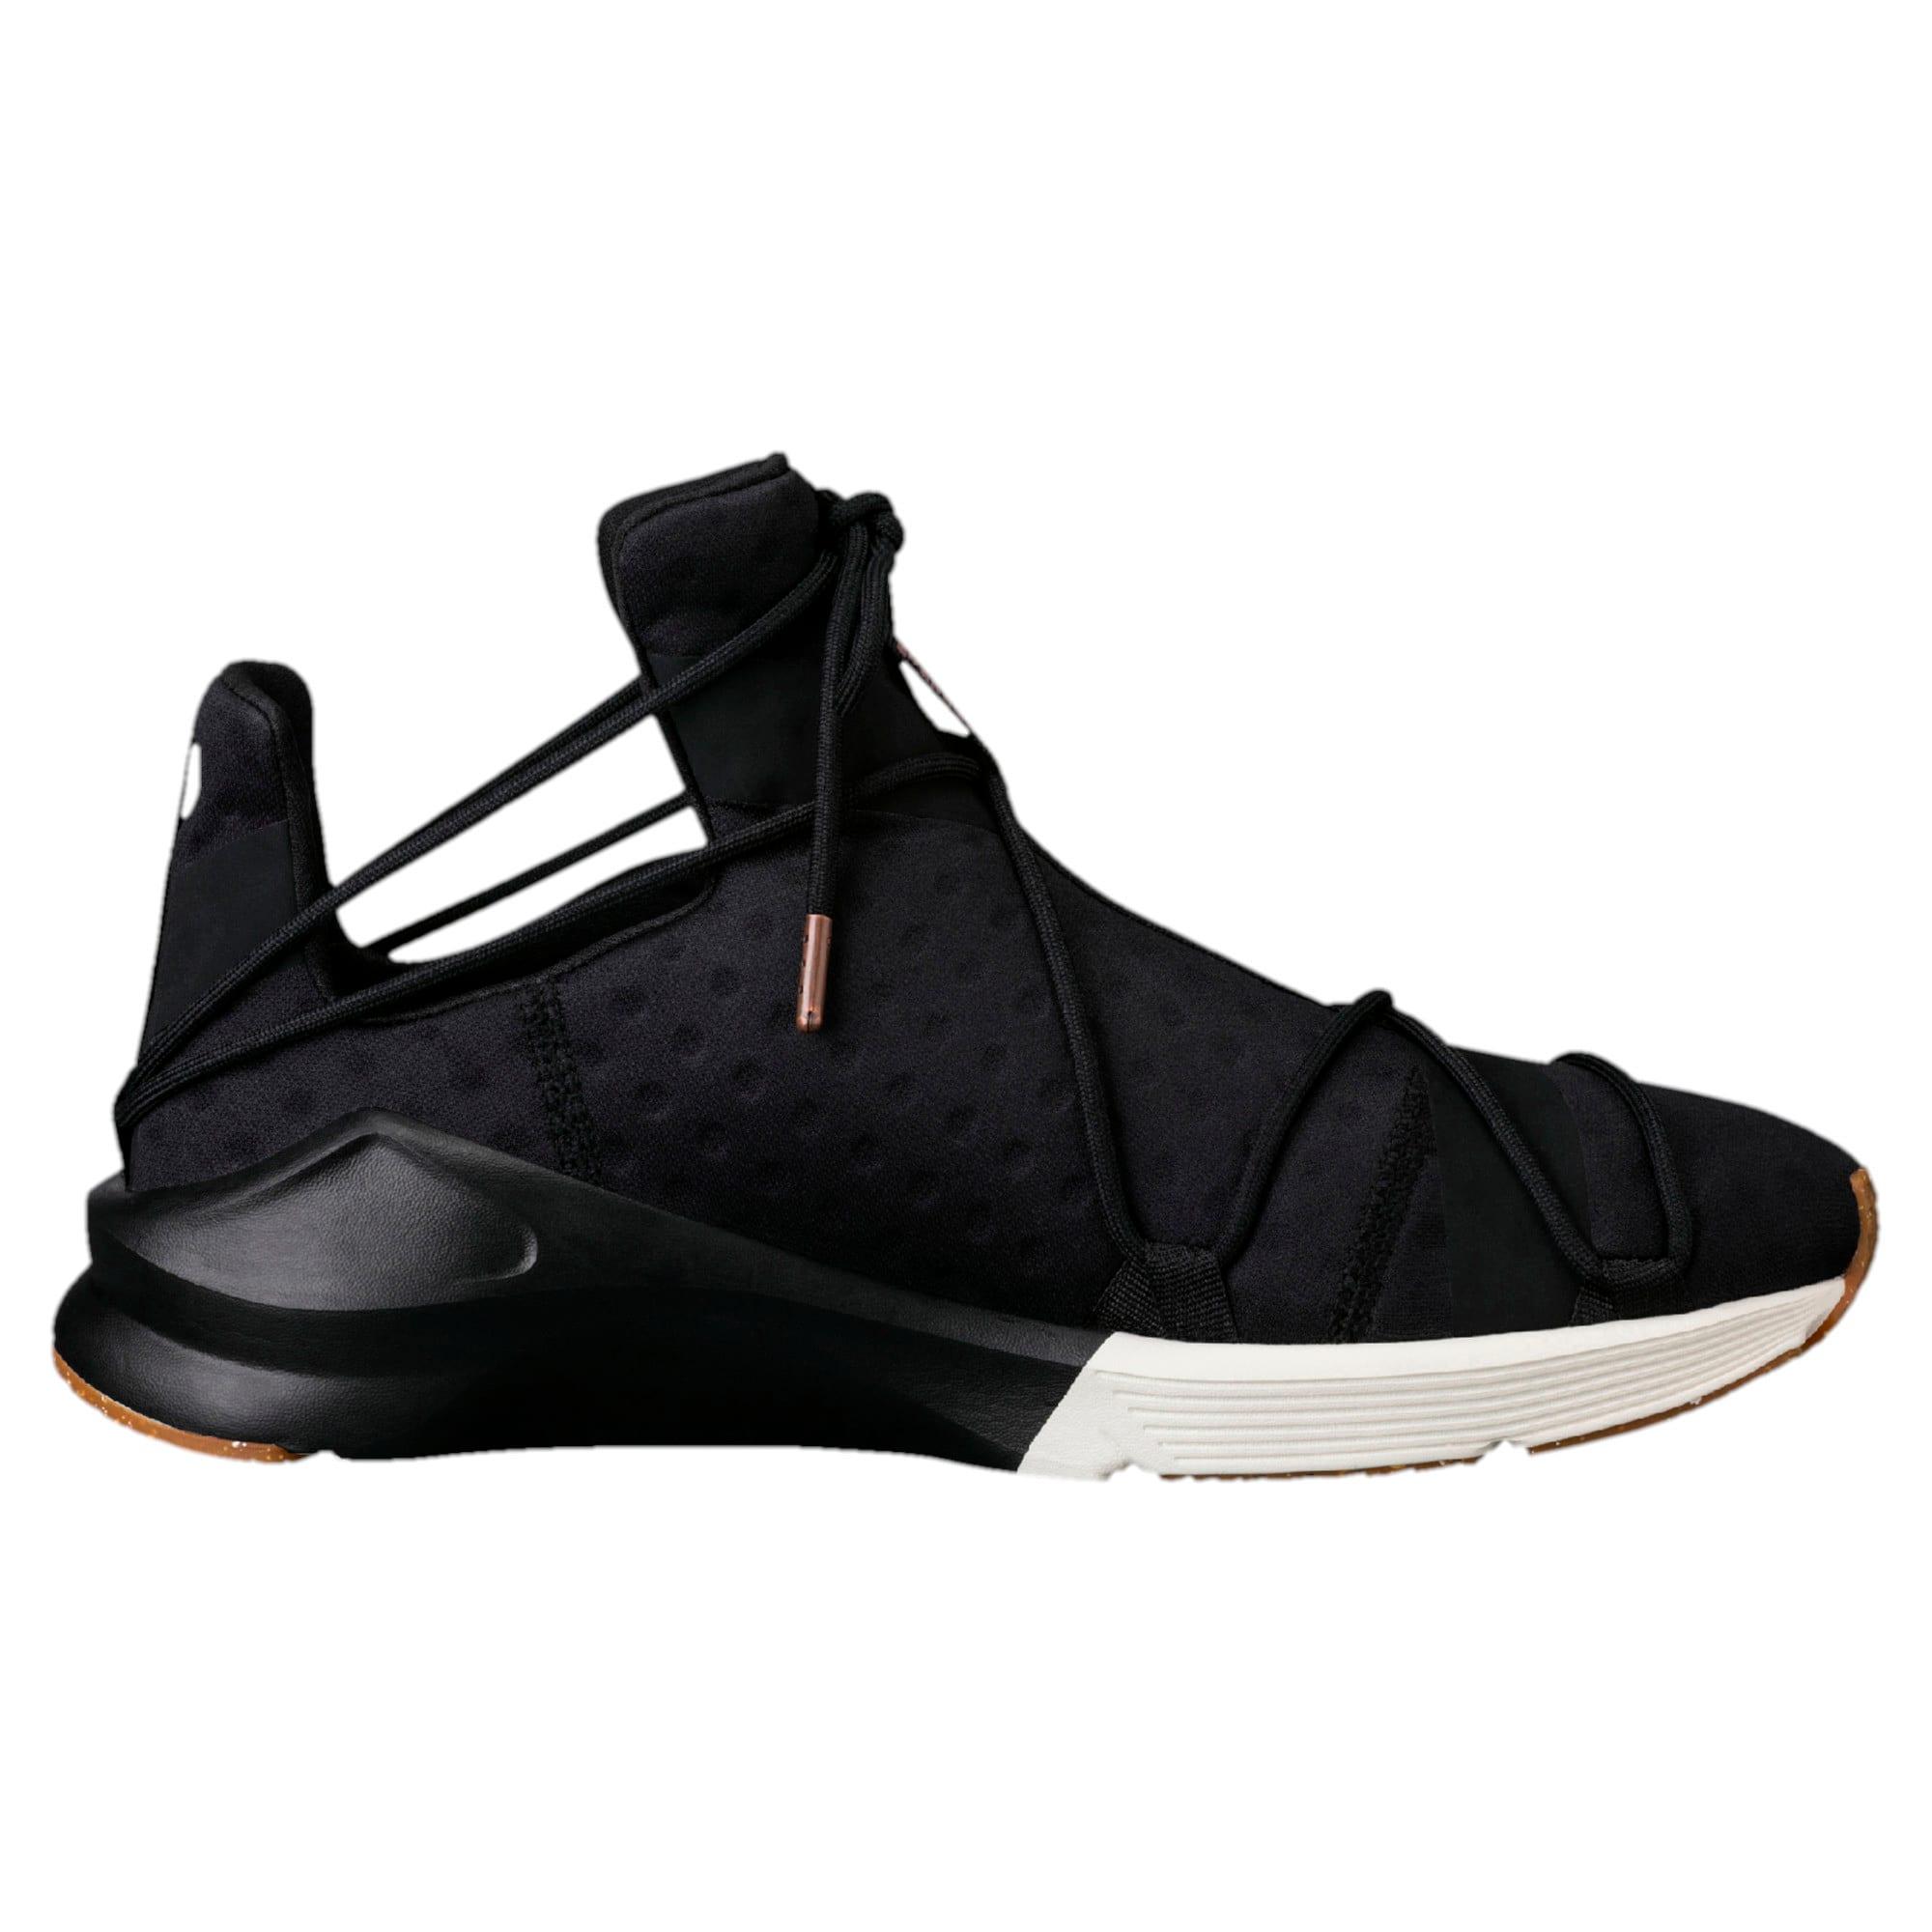 Thumbnail 5 of Fierce Rope VR Women's Training Shoes, Puma Black-Whisper White, medium-IND